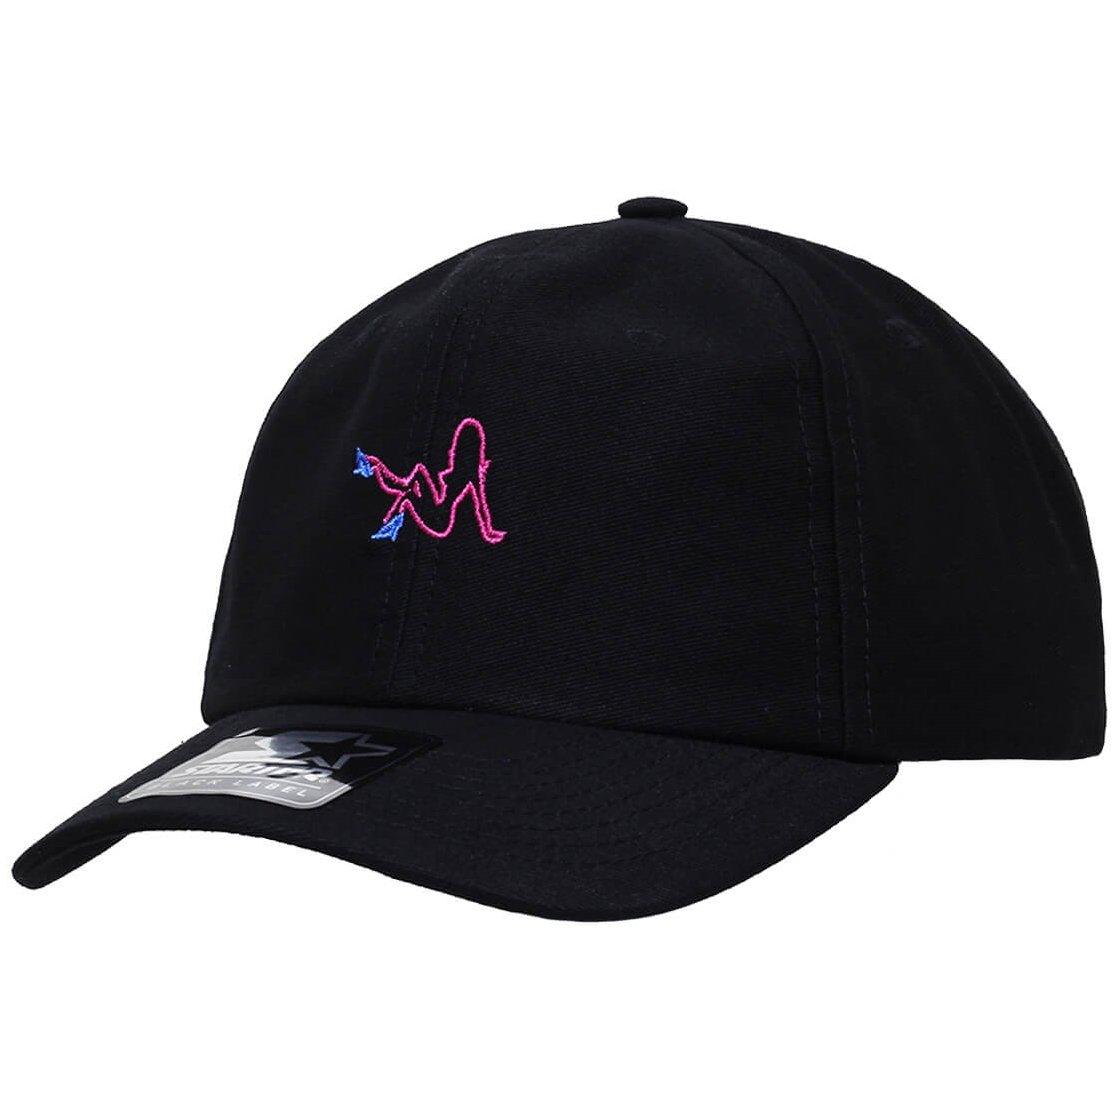 ed832b517d238 Boné Starter Aba Curva Strapback Neon Girls  Dad Hats  - Compre Agora